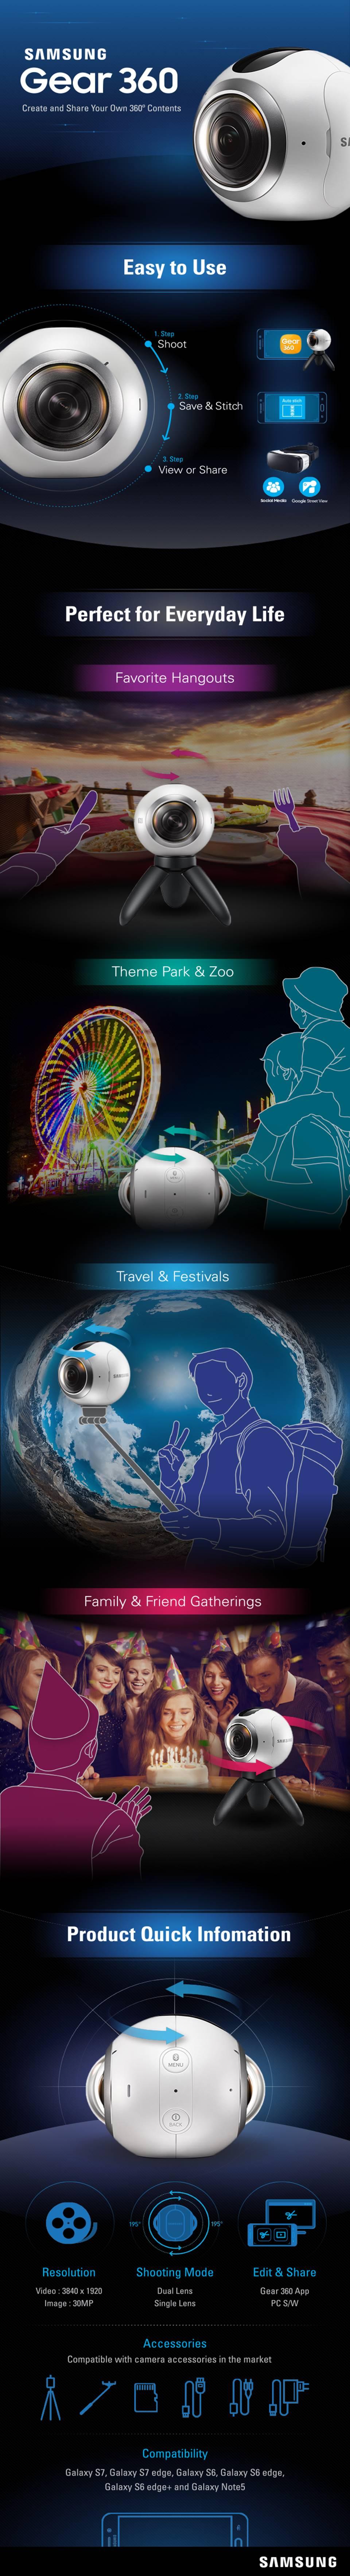 Infográfico da Samsung explica funcionamento e funcionalidades do Gear 360